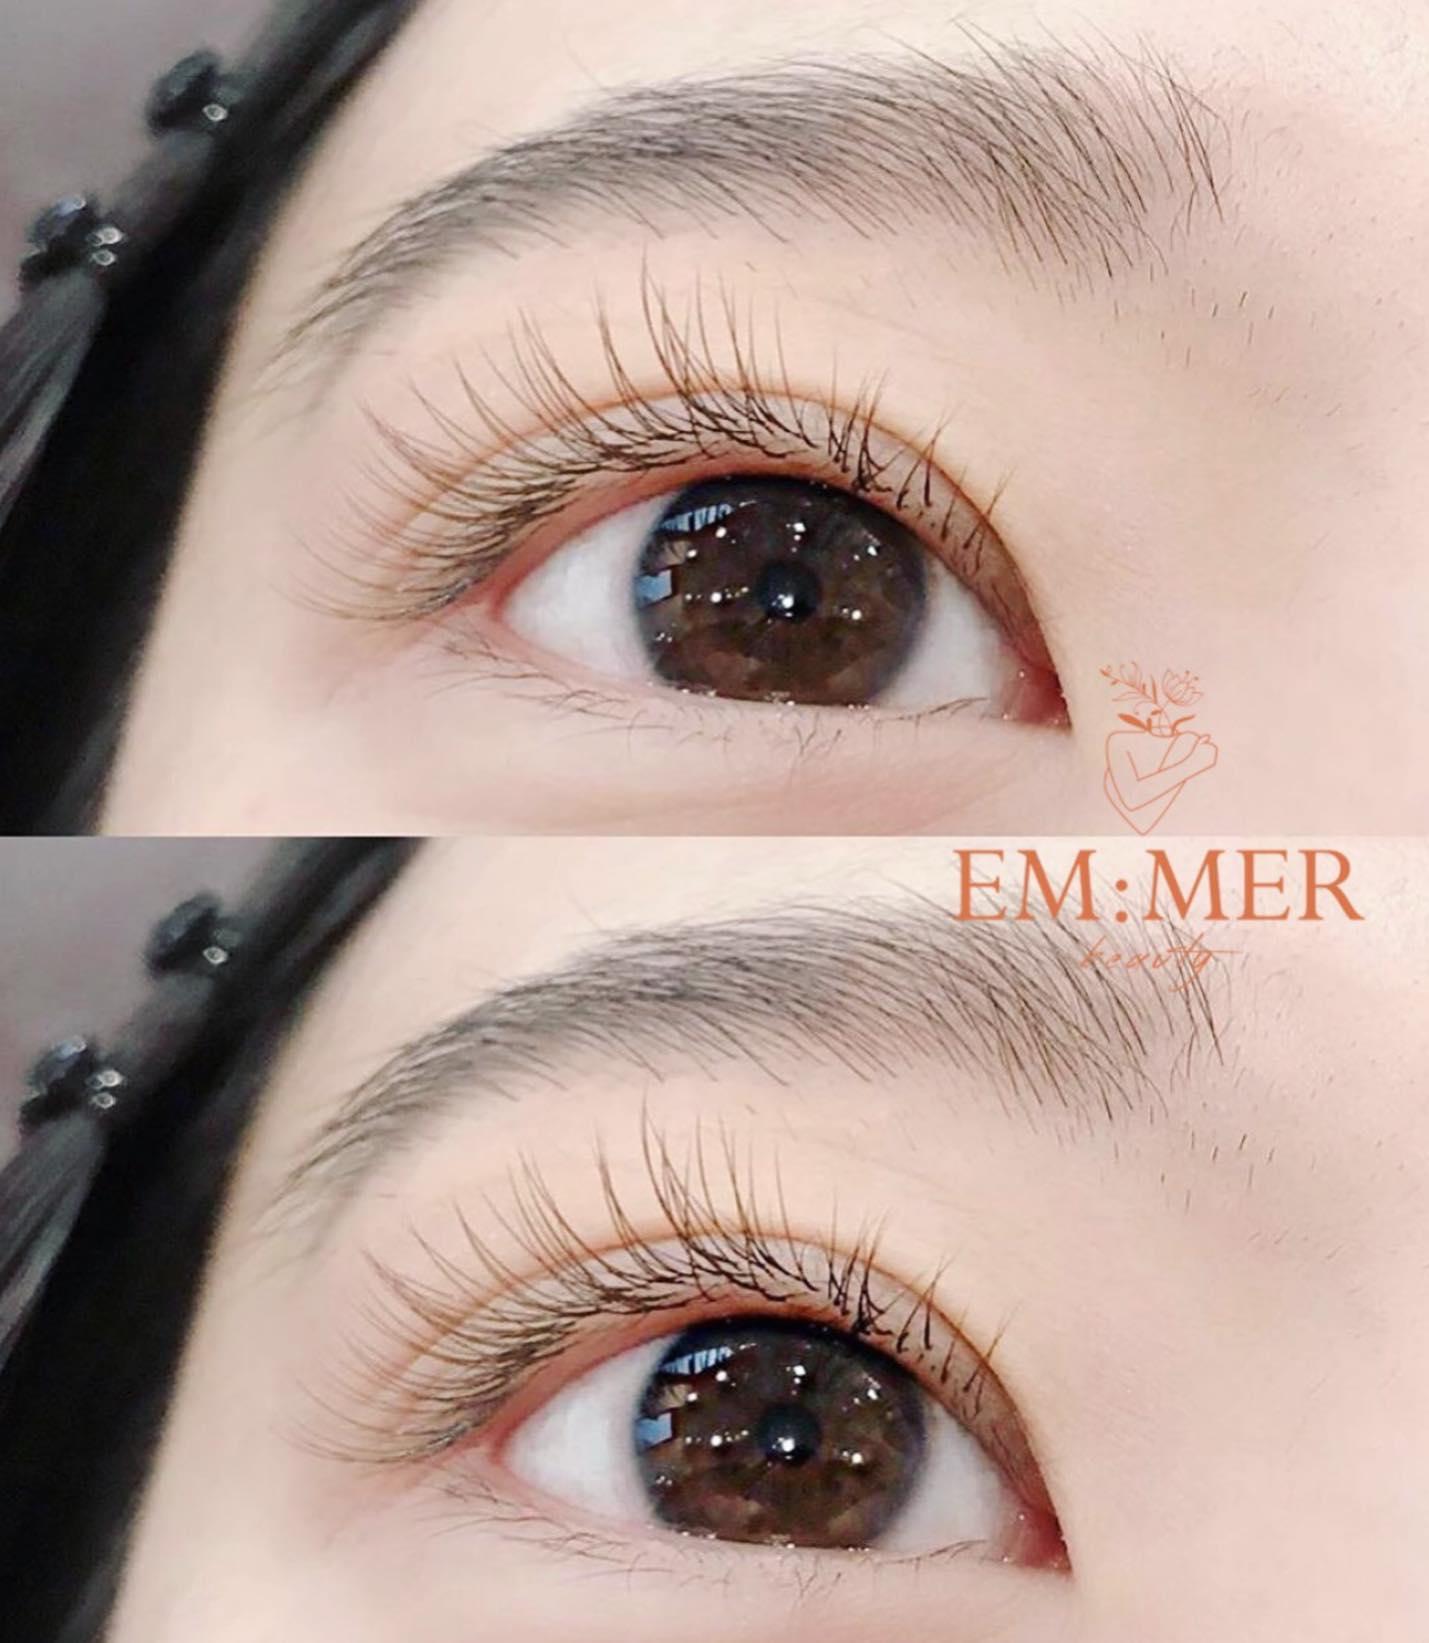 Em:mer Beauty & Academy 1